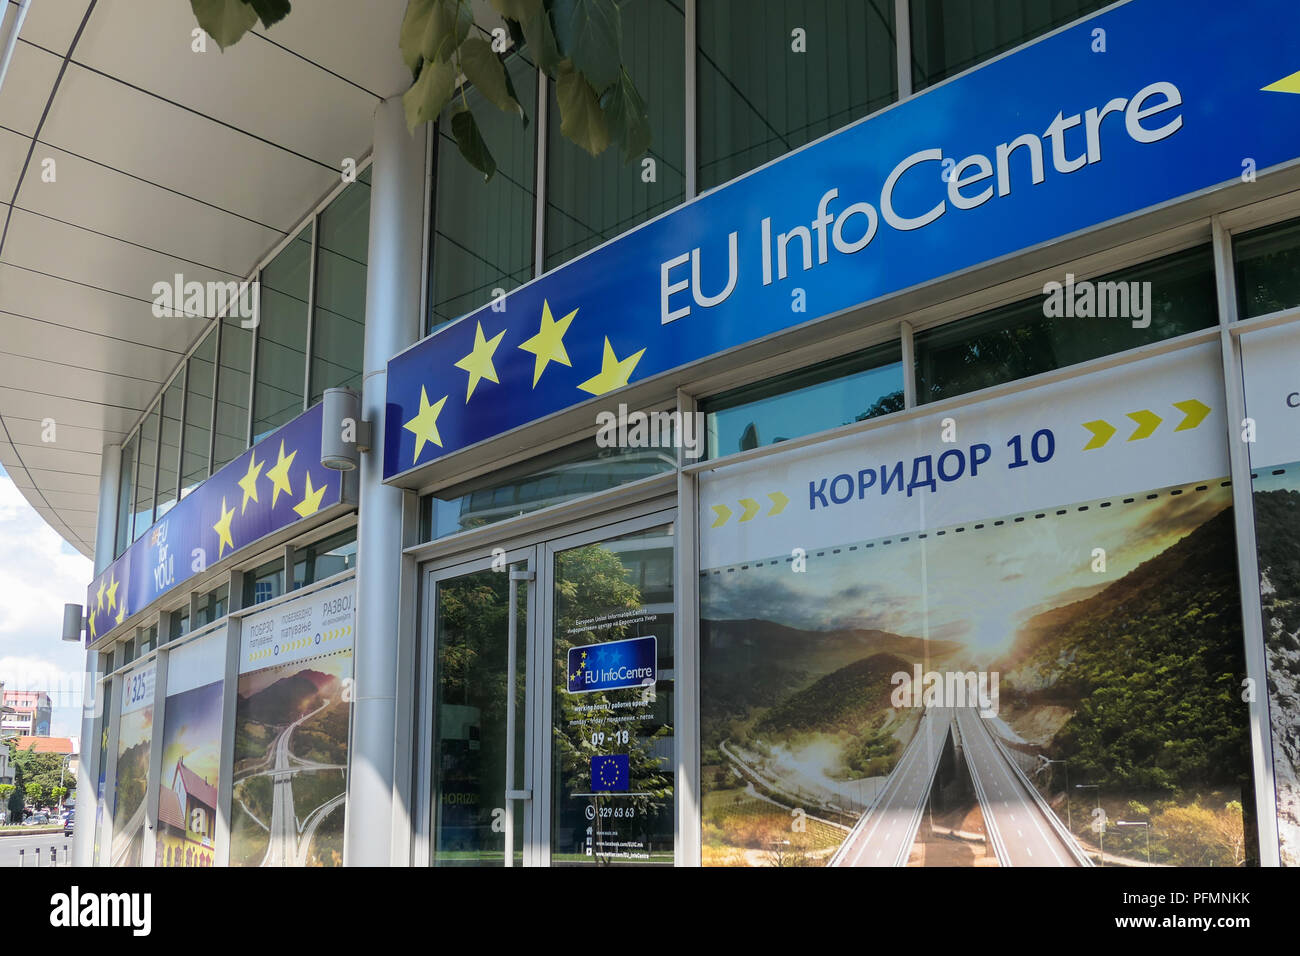 EU Info Centre, Skopje, Macedonia - Stock Image